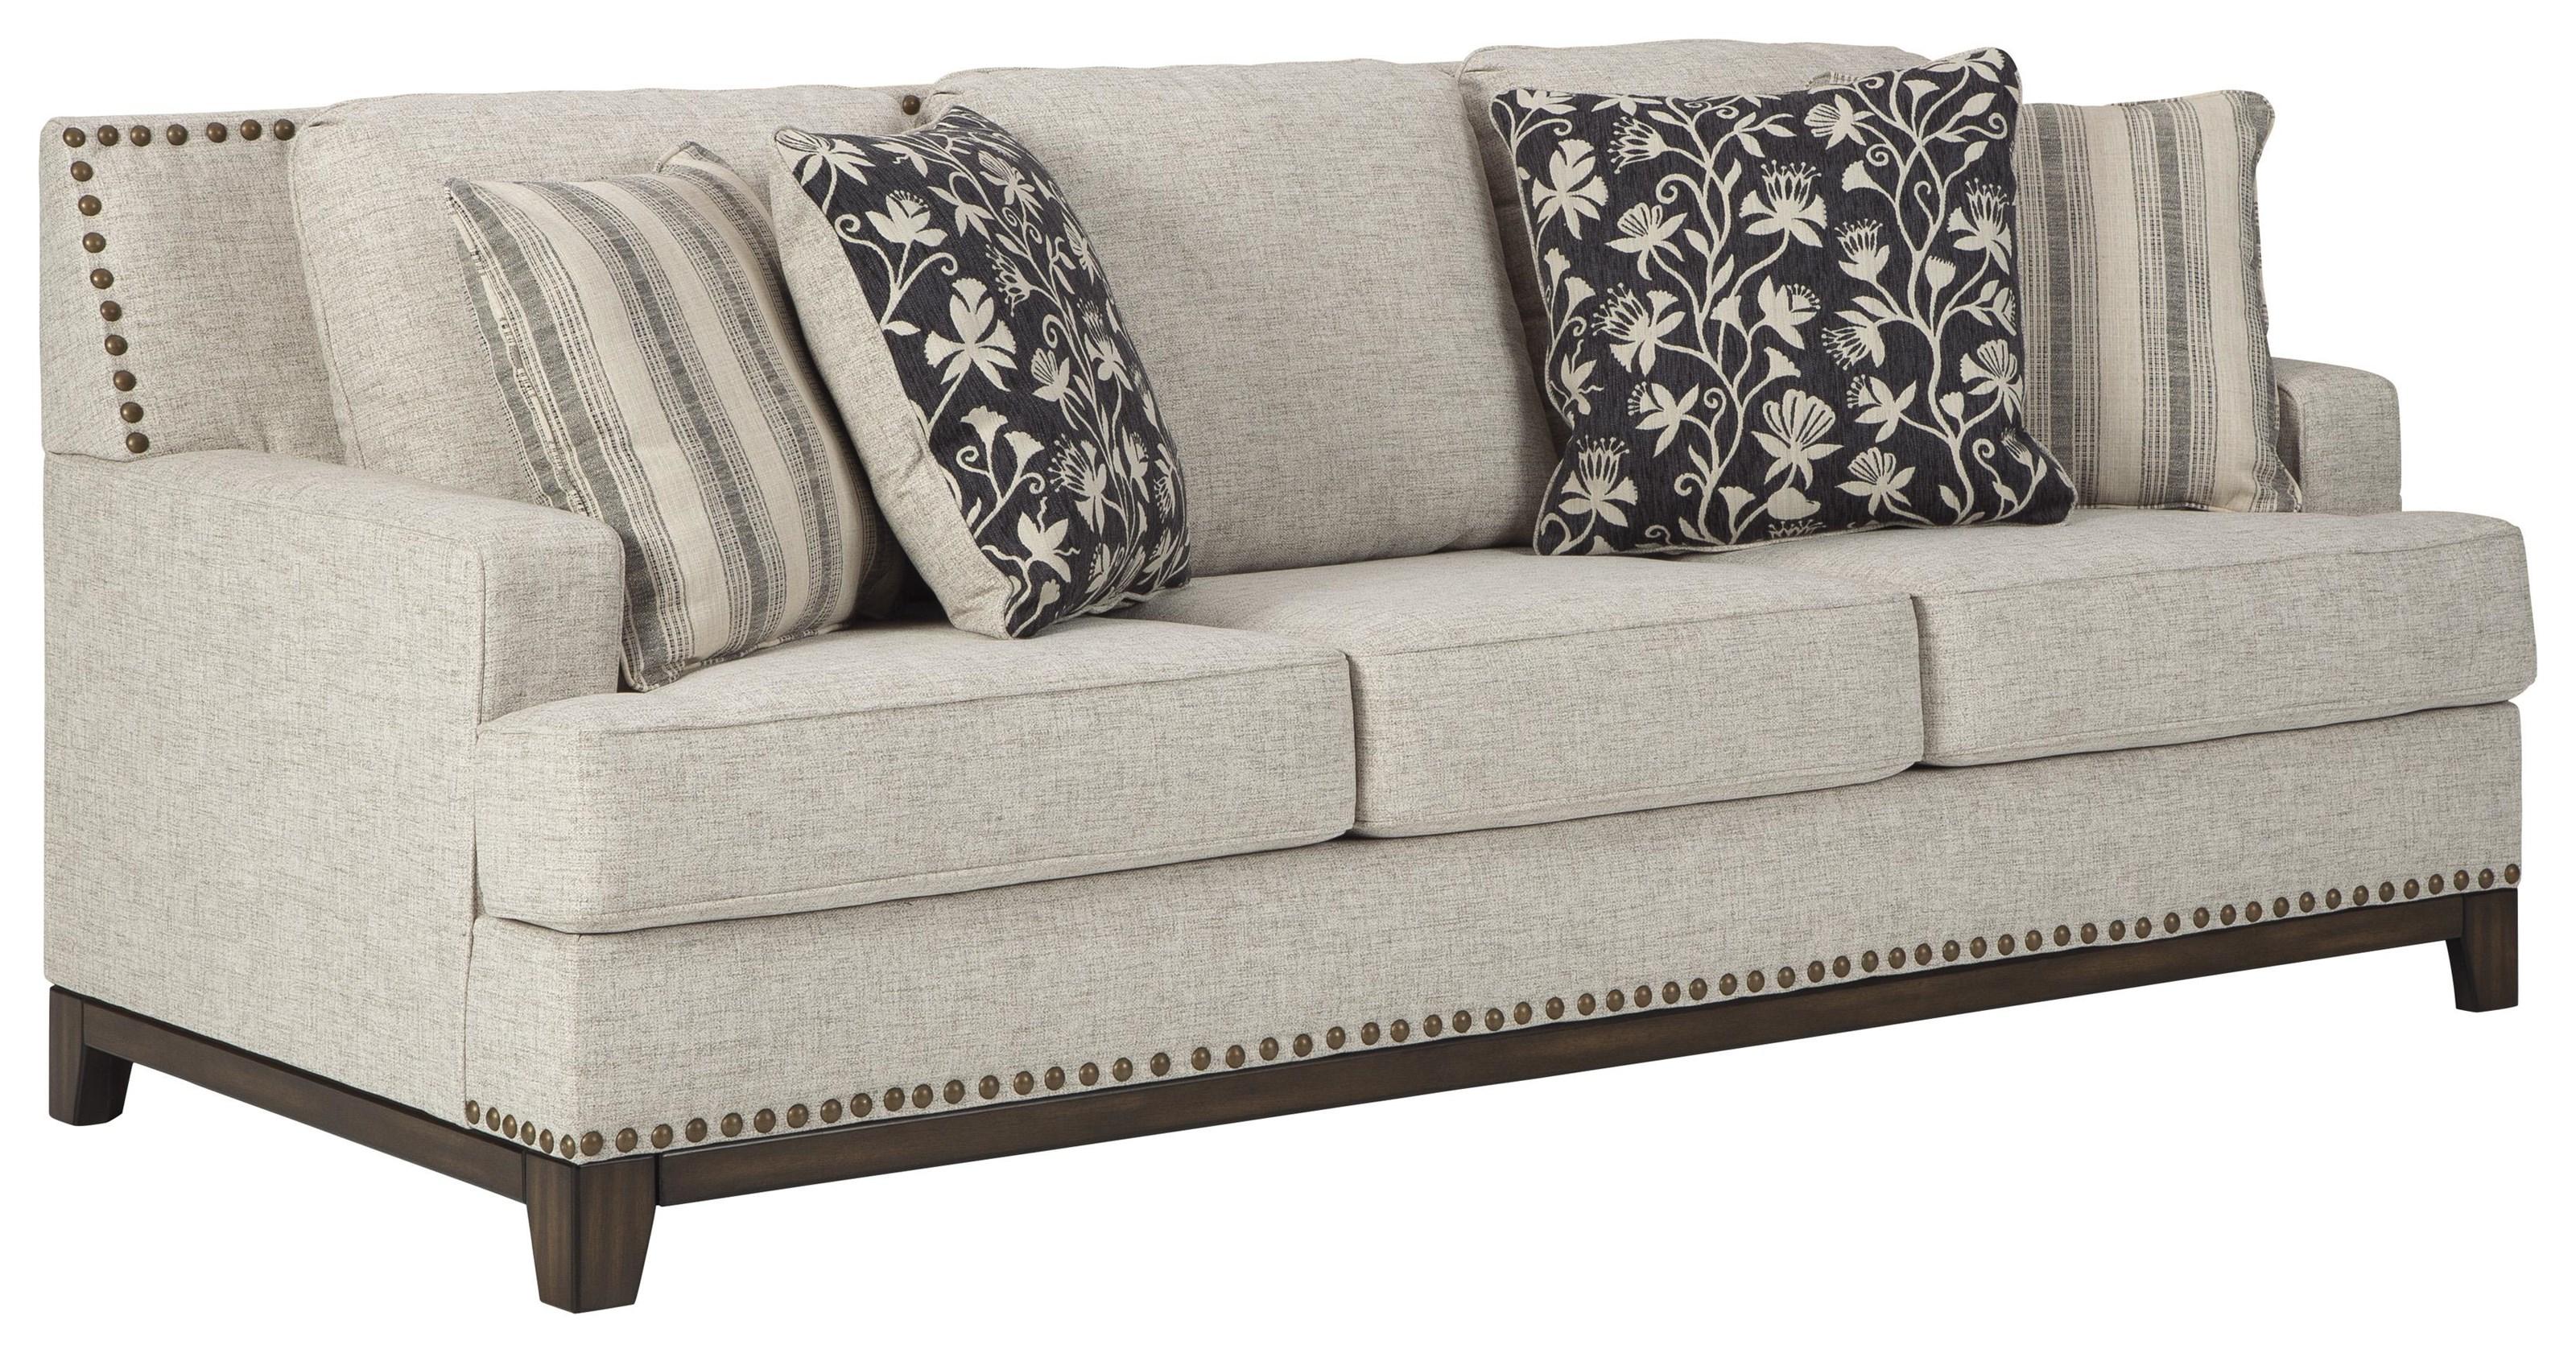 Ashley Furniture Ballina 1470738 Linen